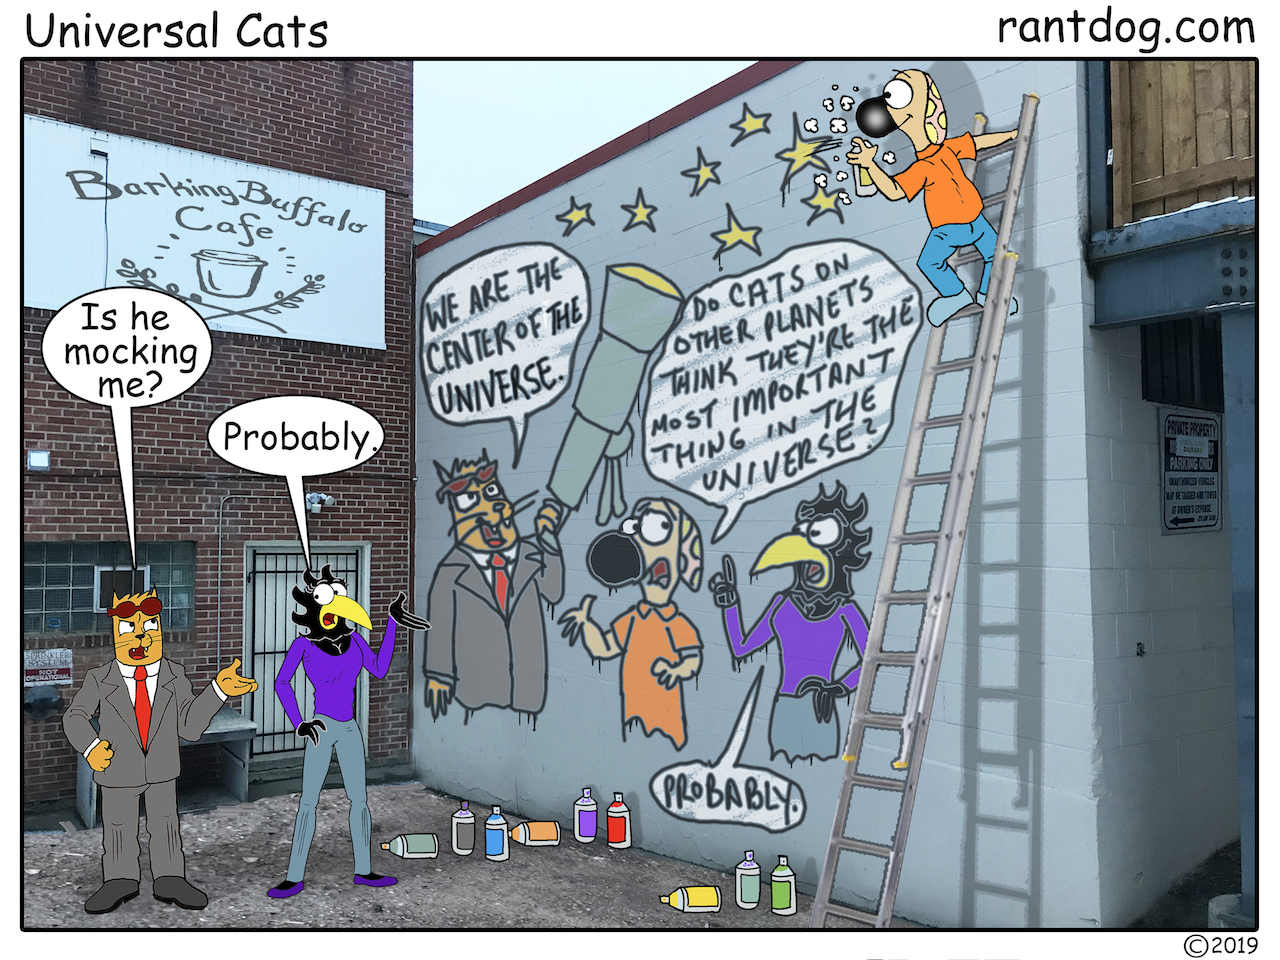 RDC_682_Universal Cats 2.jpg